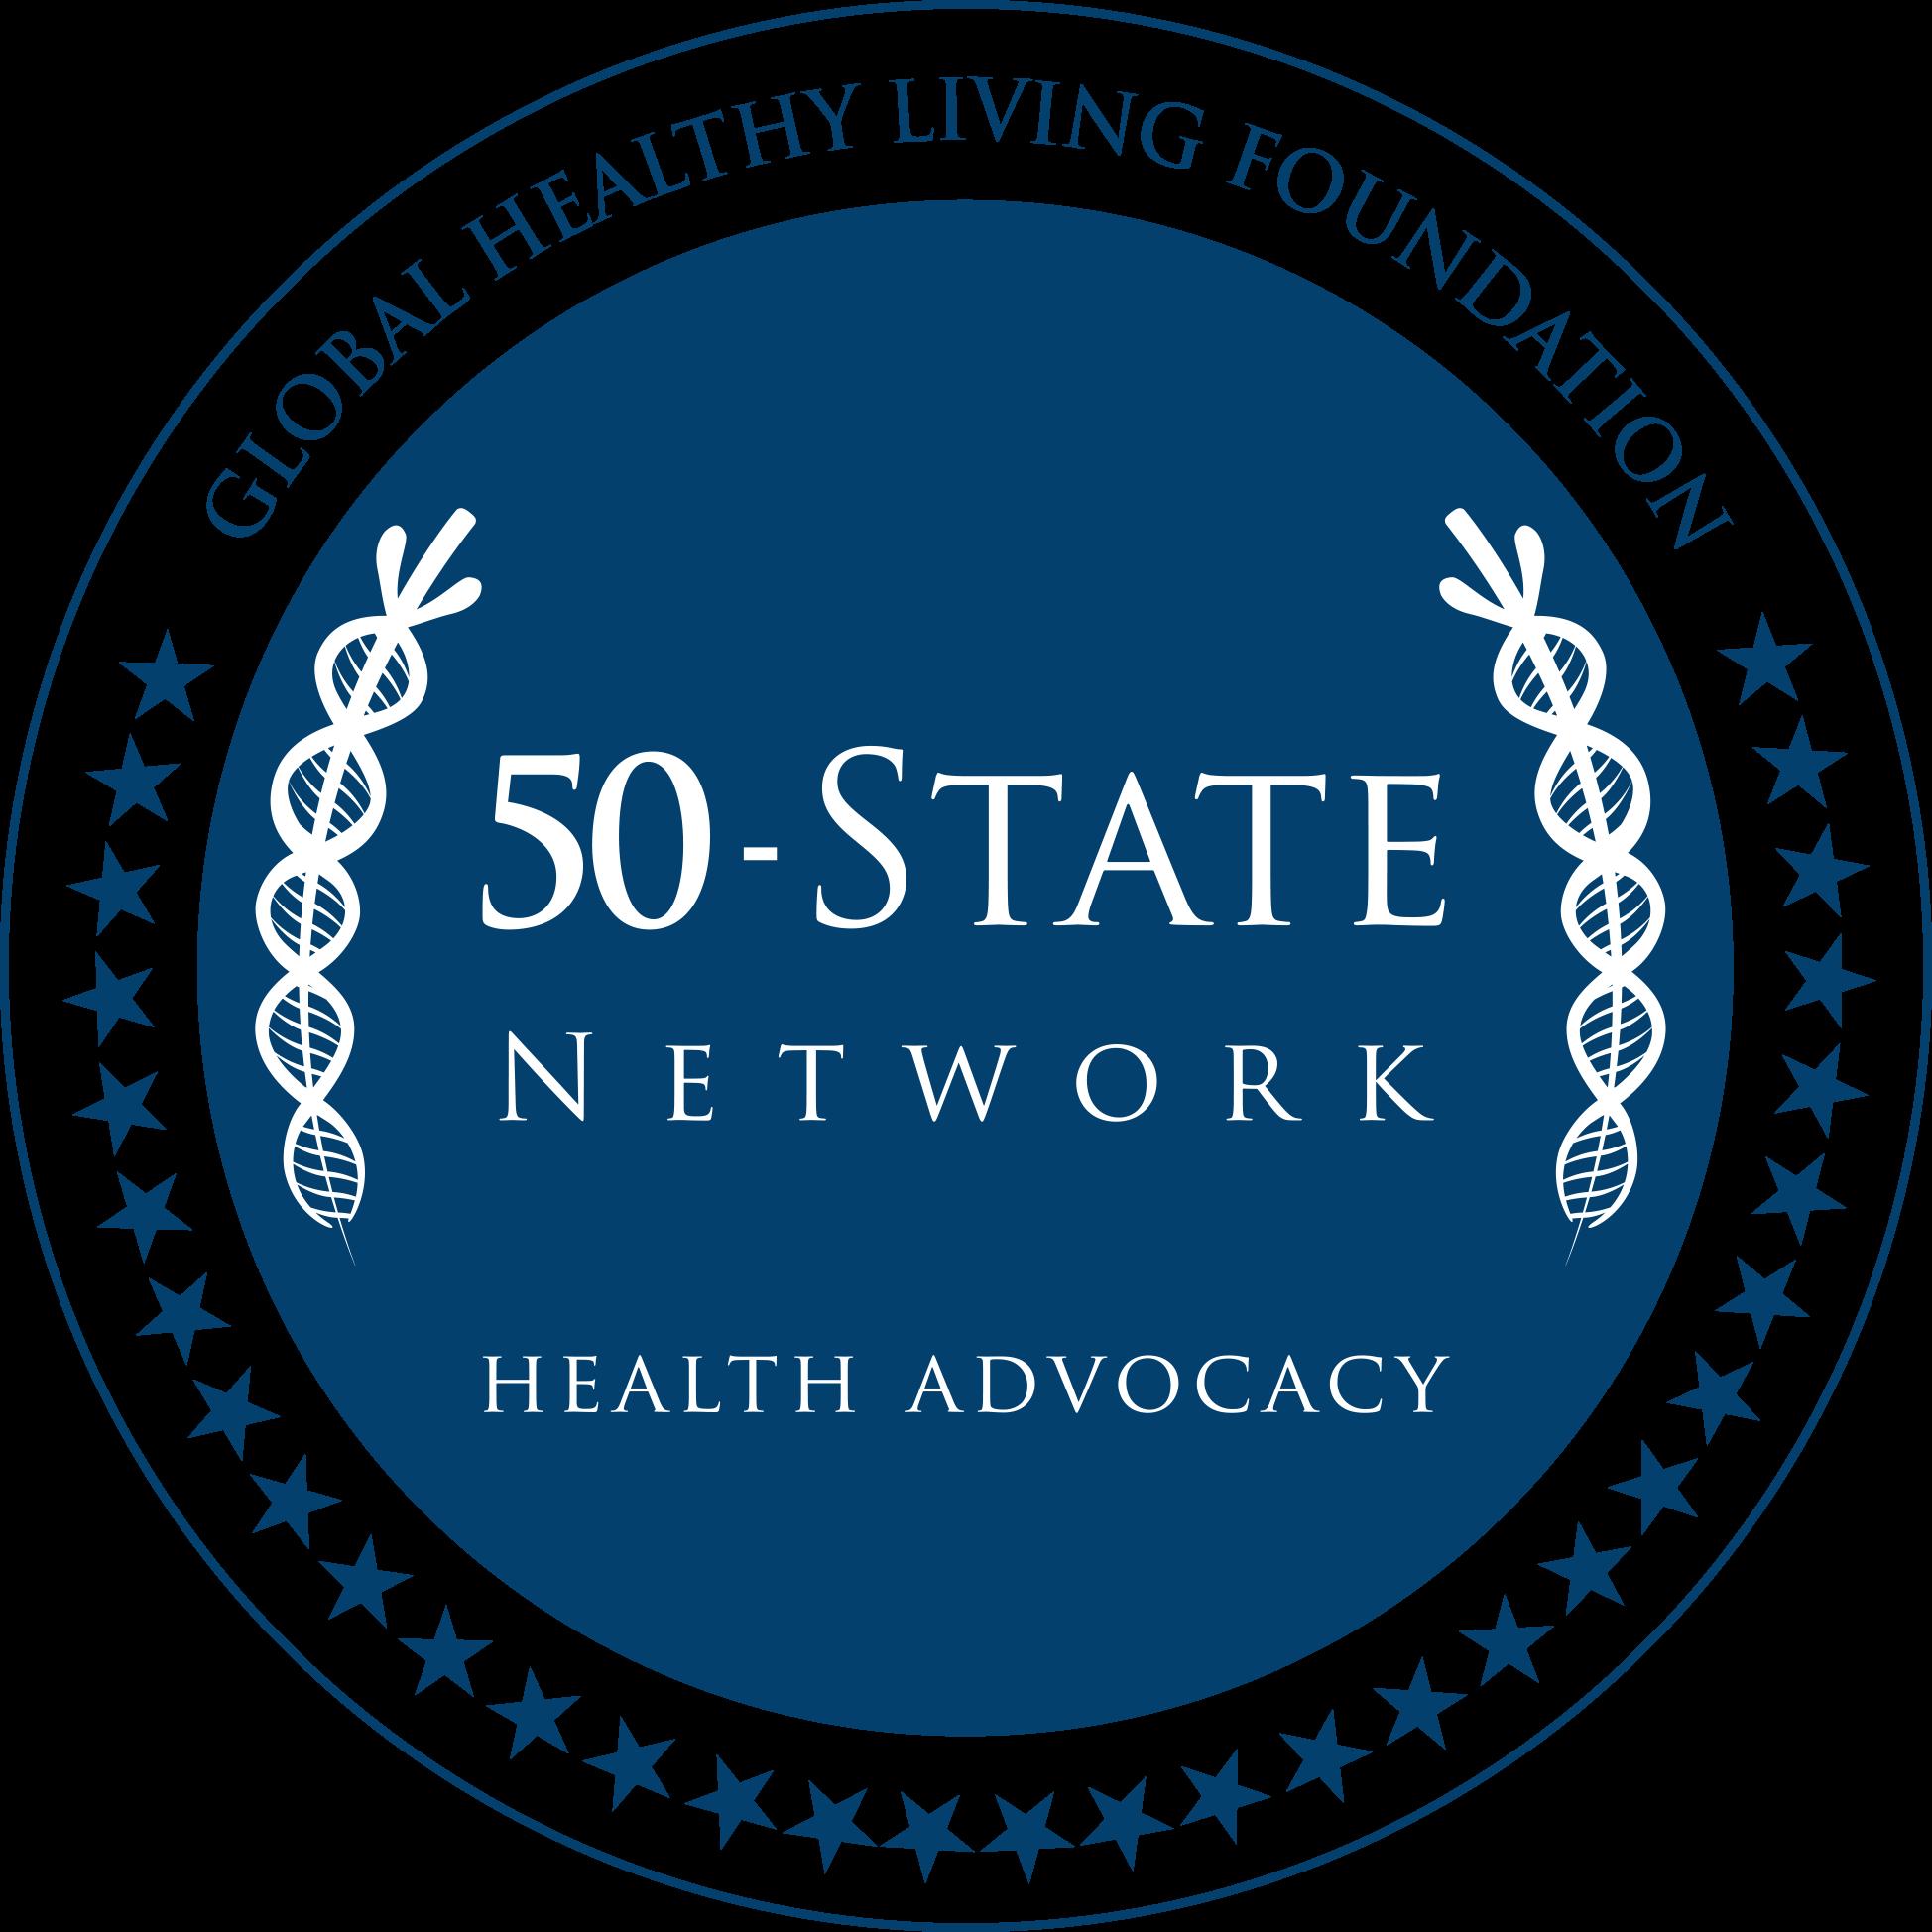 seths50StateNetwork_logo_NEW_ghlf3_transparent